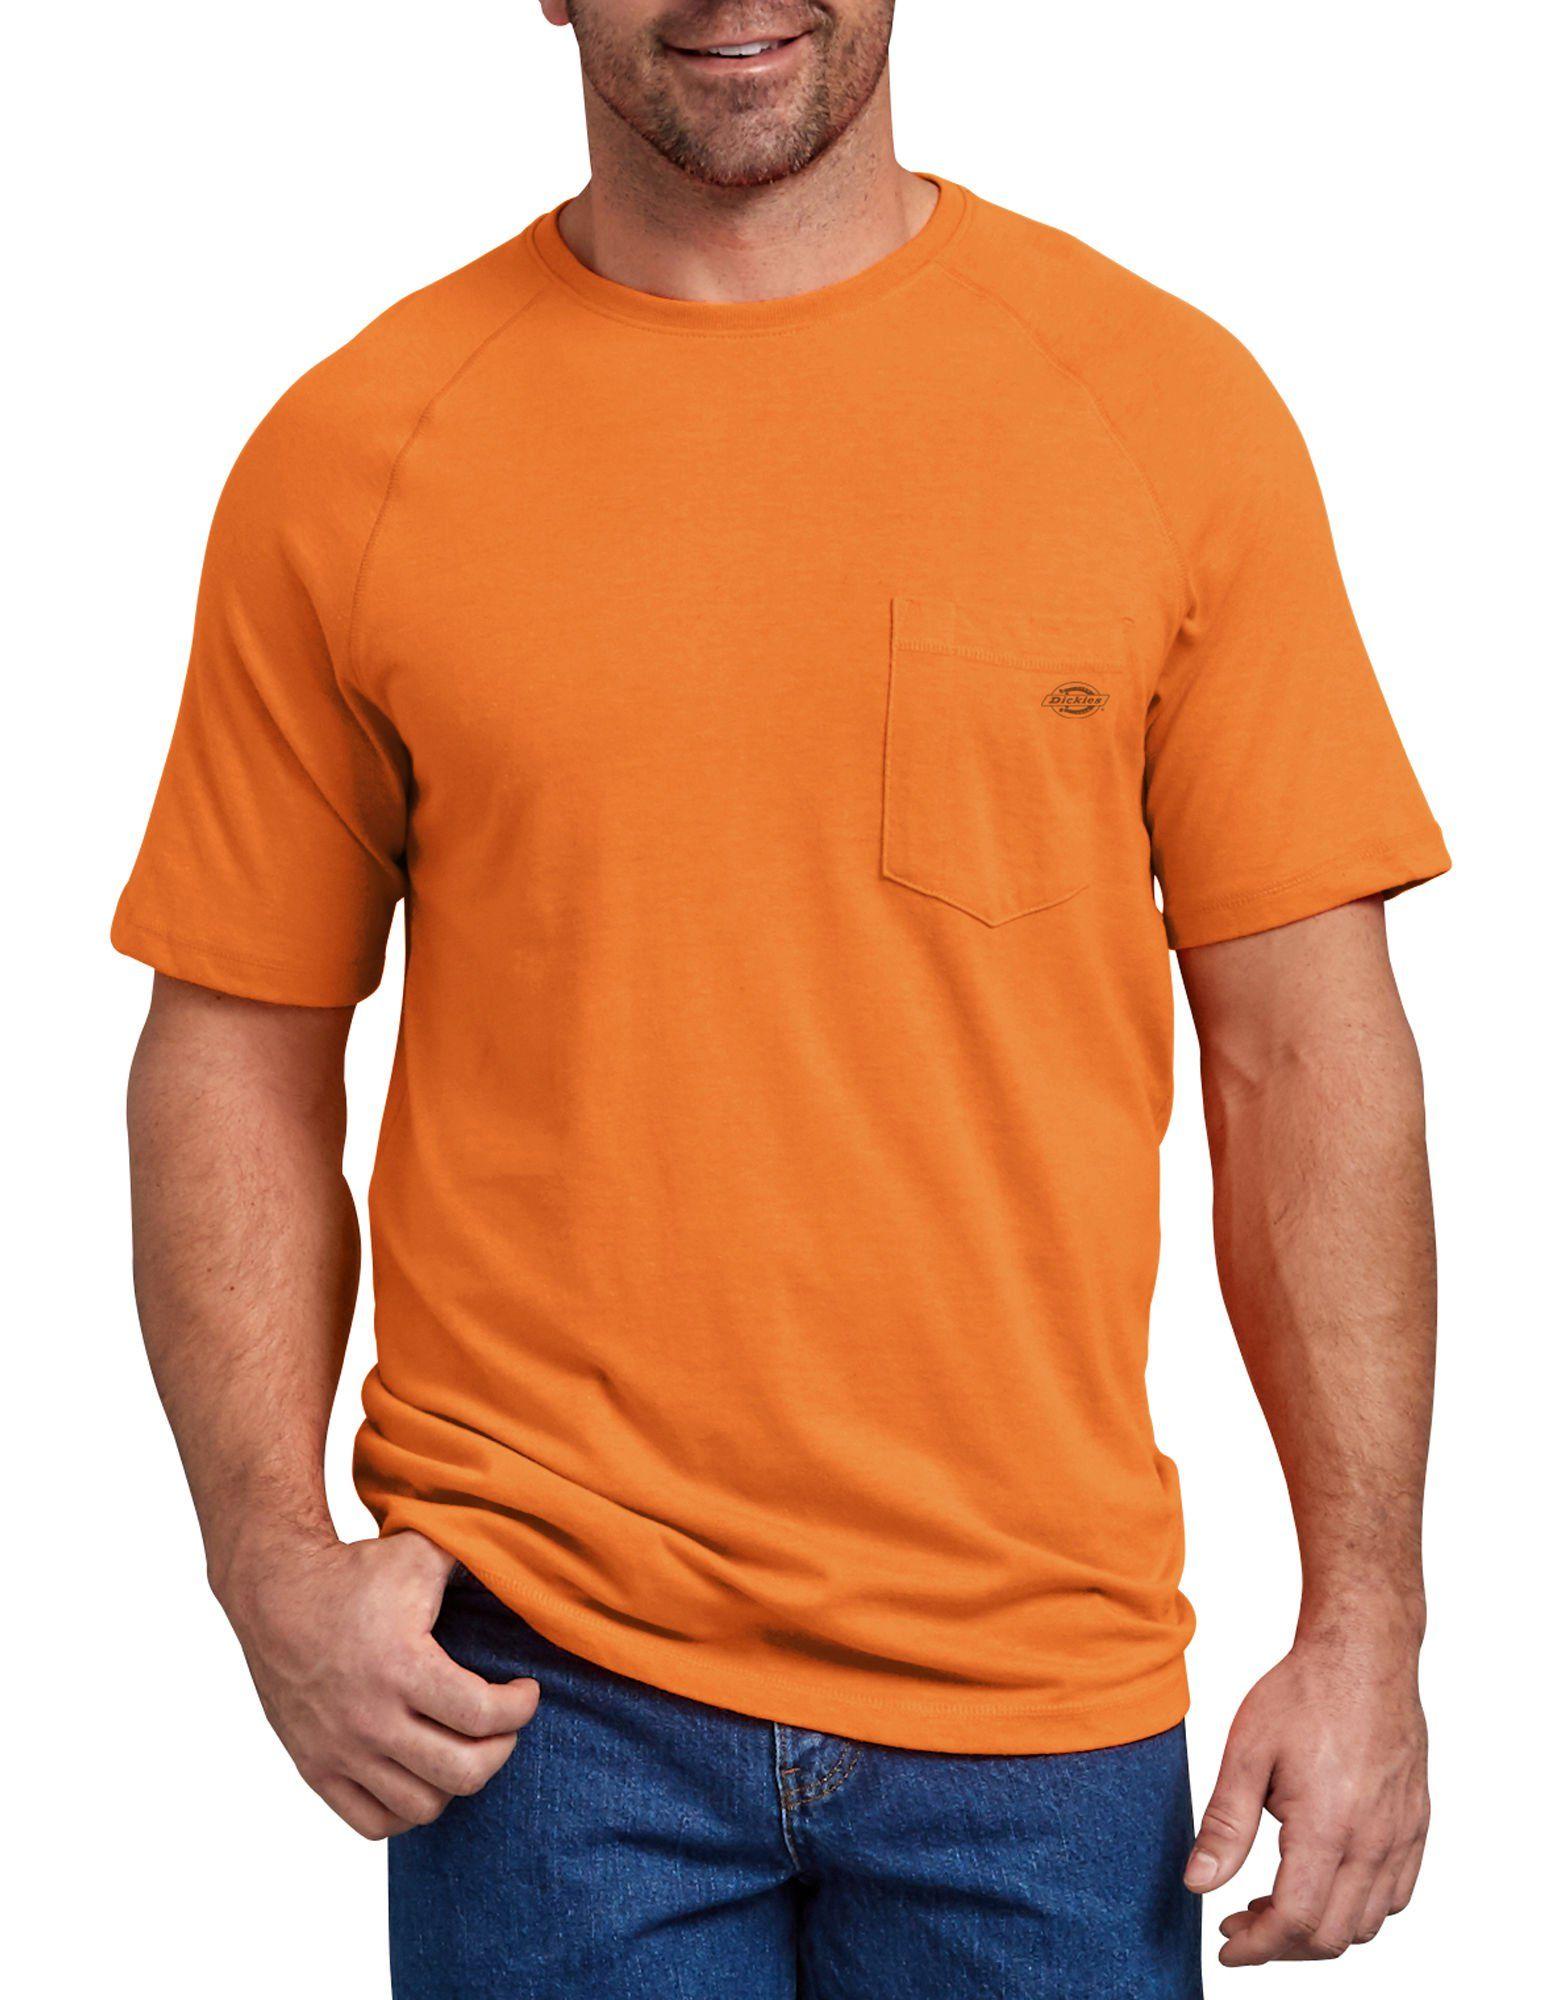 Temp Iq Performance Cooling T Shirt Cool T Shirts T Shirt